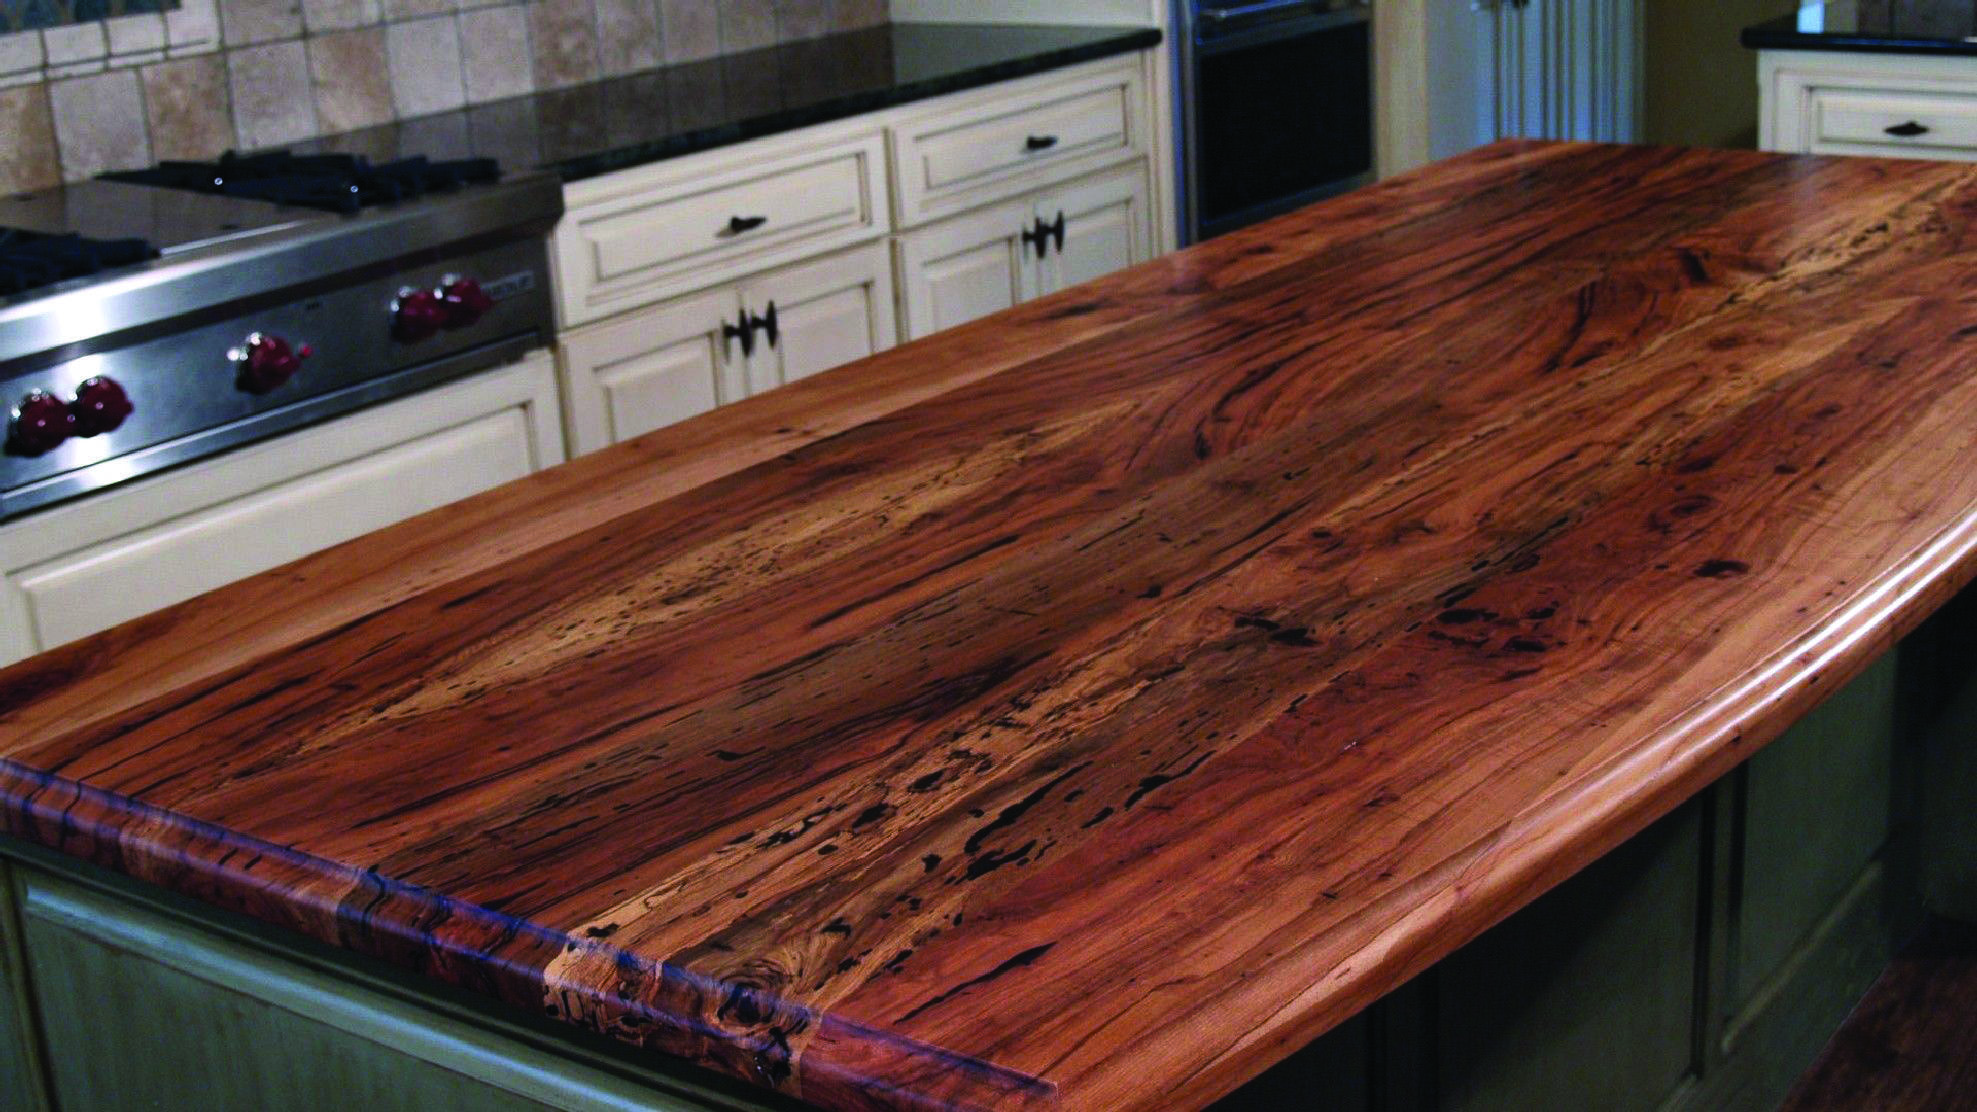 20 Examples Of Stylish Butcher Block Countertops Outdoor Kitchen